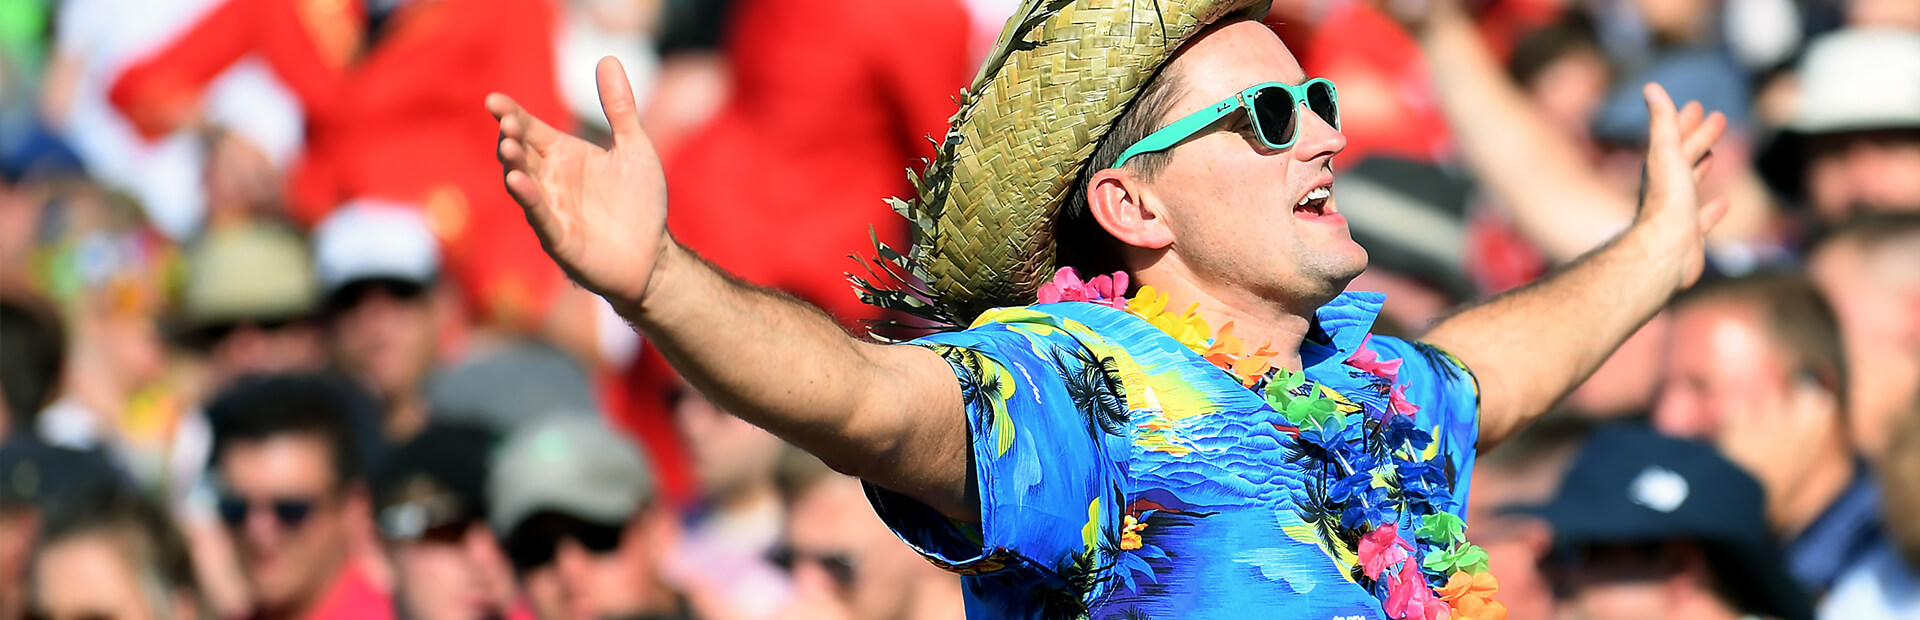 We're bringing summer back! Bears T20 at Edgbaston